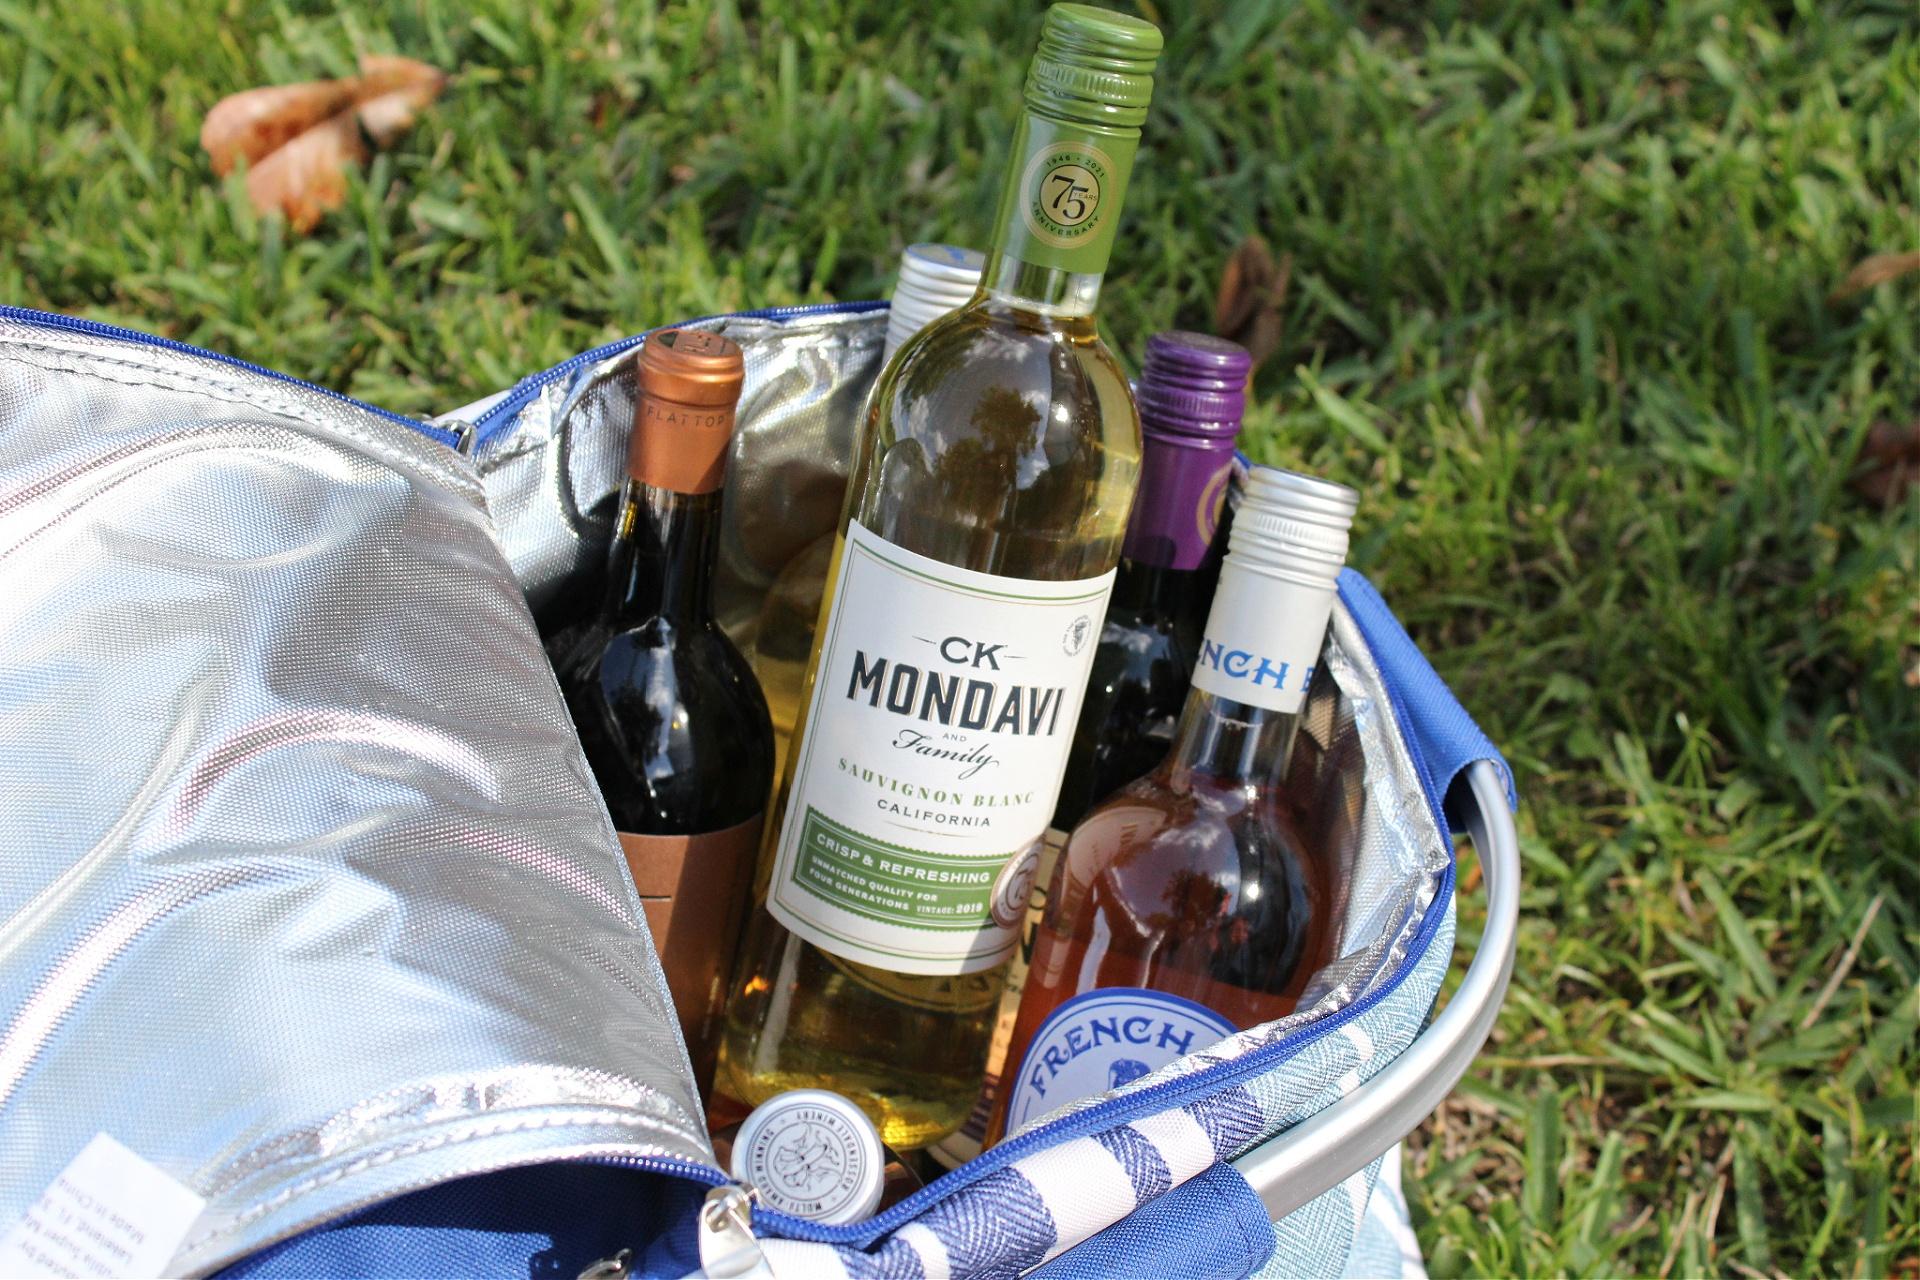 Best Picnic Cheap Wines